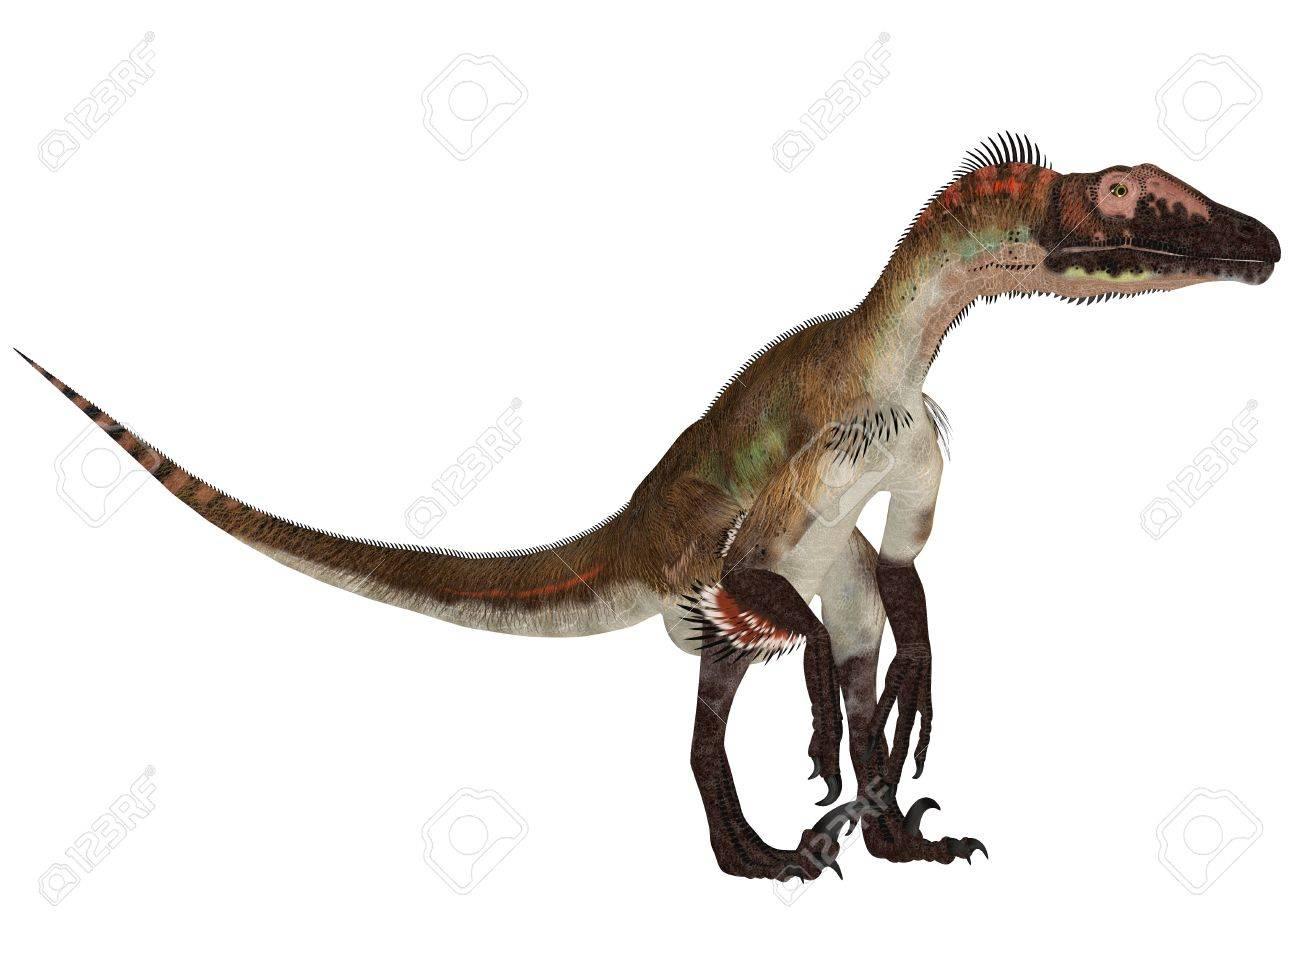 Illustration Of An Utahraptor Dinosaur Species Isolated On Stock 1300x968